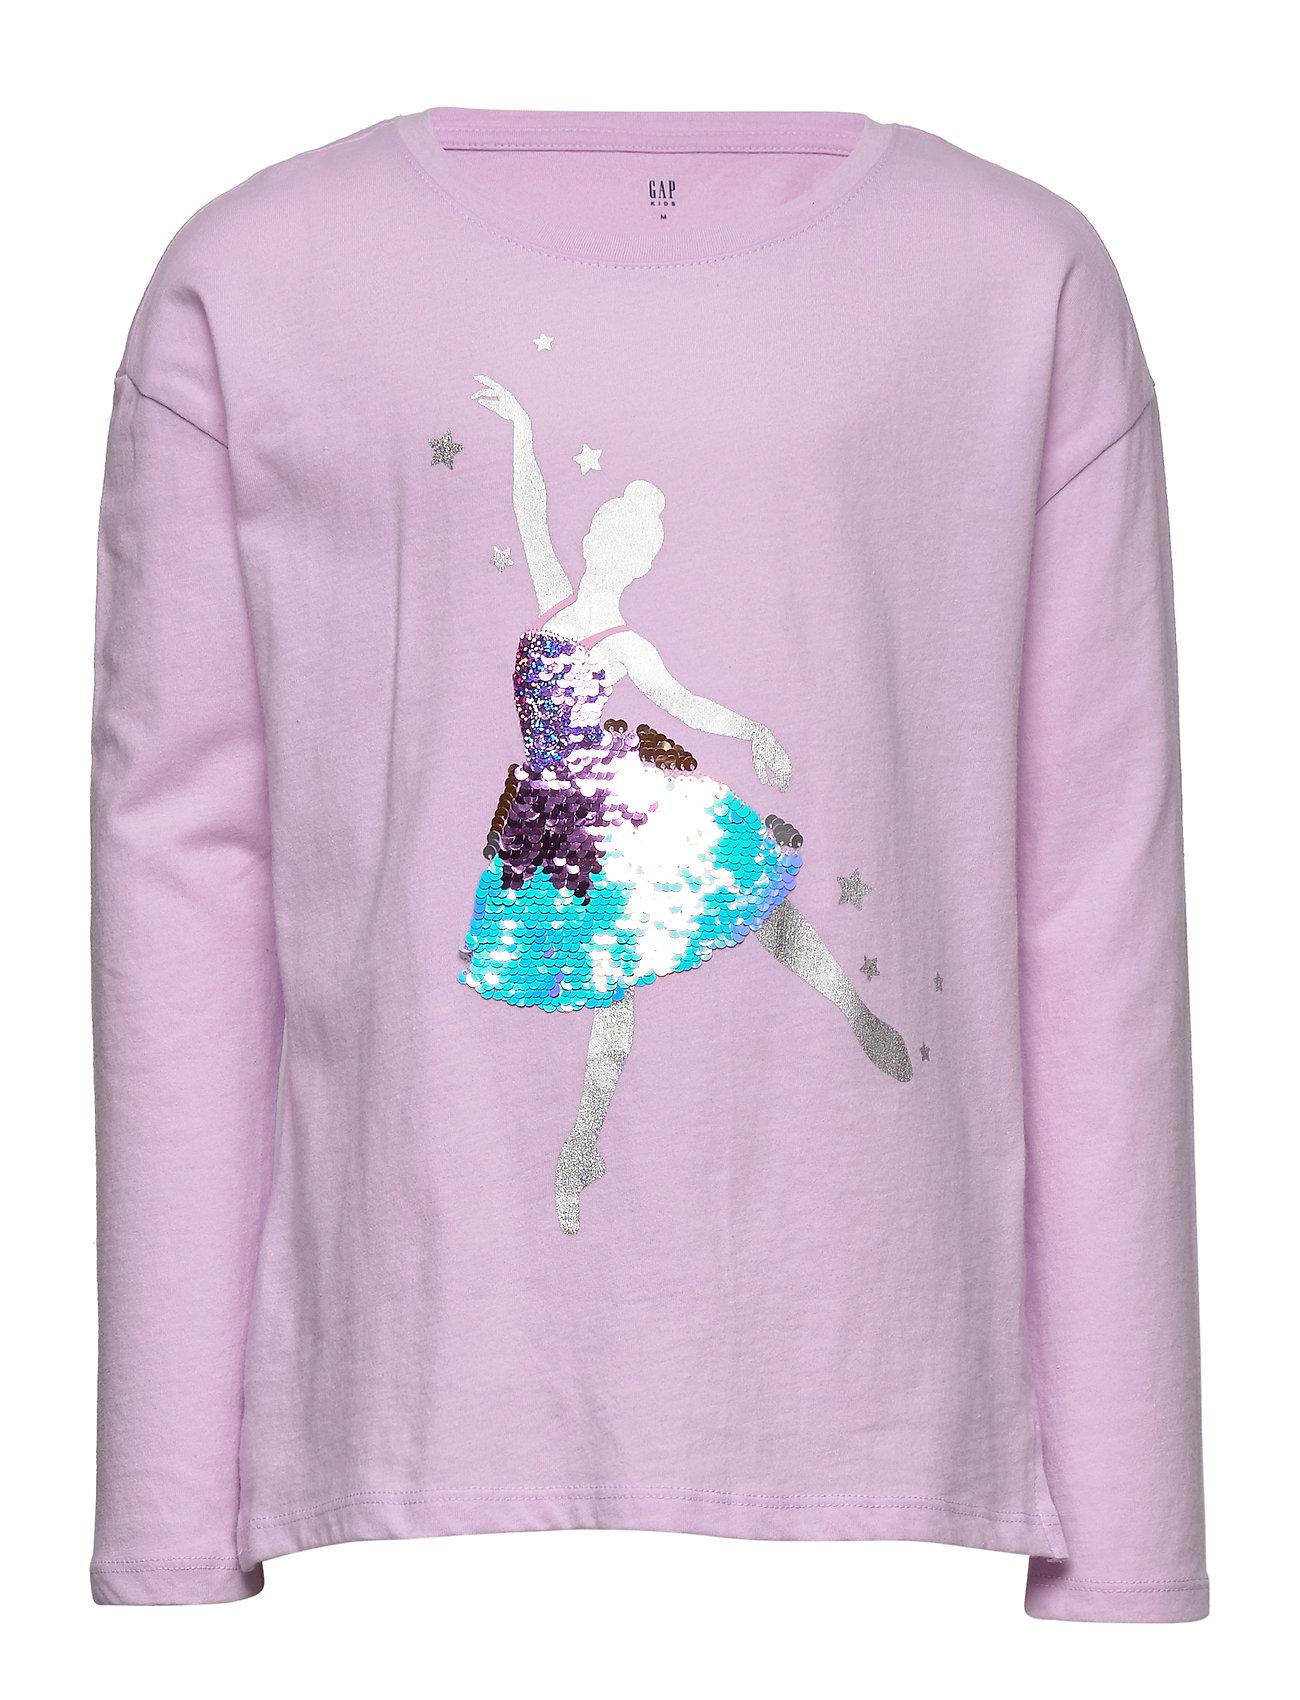 GAP Kids Holiday Flippy Sequin Graphic T-shirt - VIOLET MIST